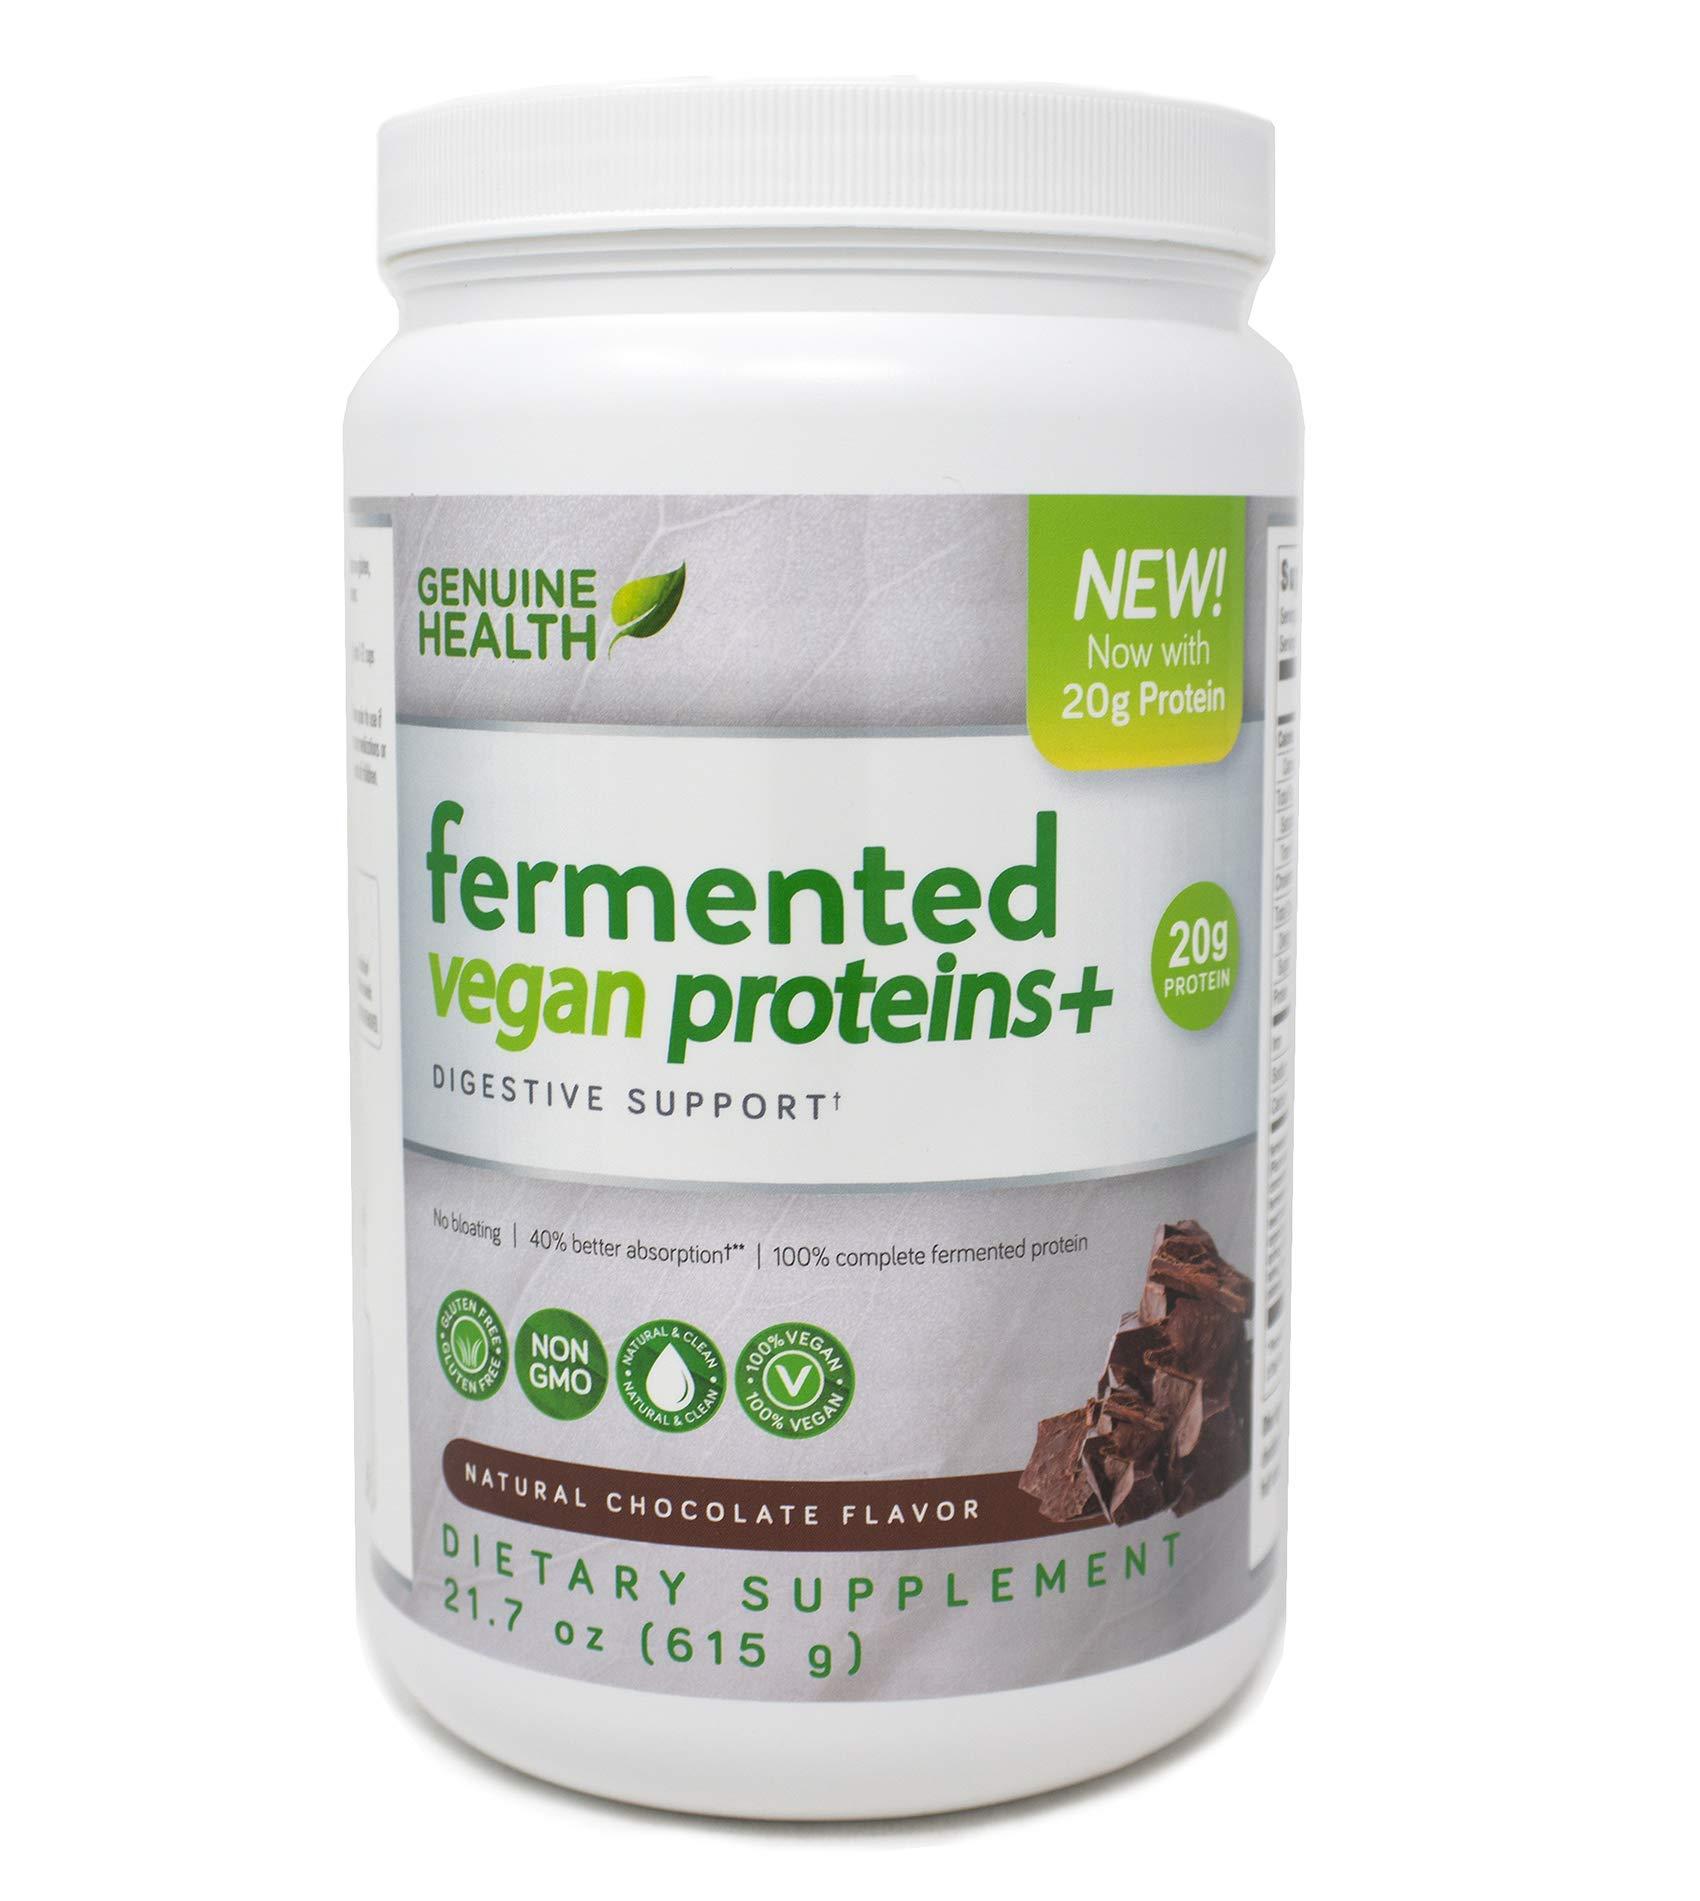 Genuine Health Fermented Vegan Proteins+, 615g, Chocolate